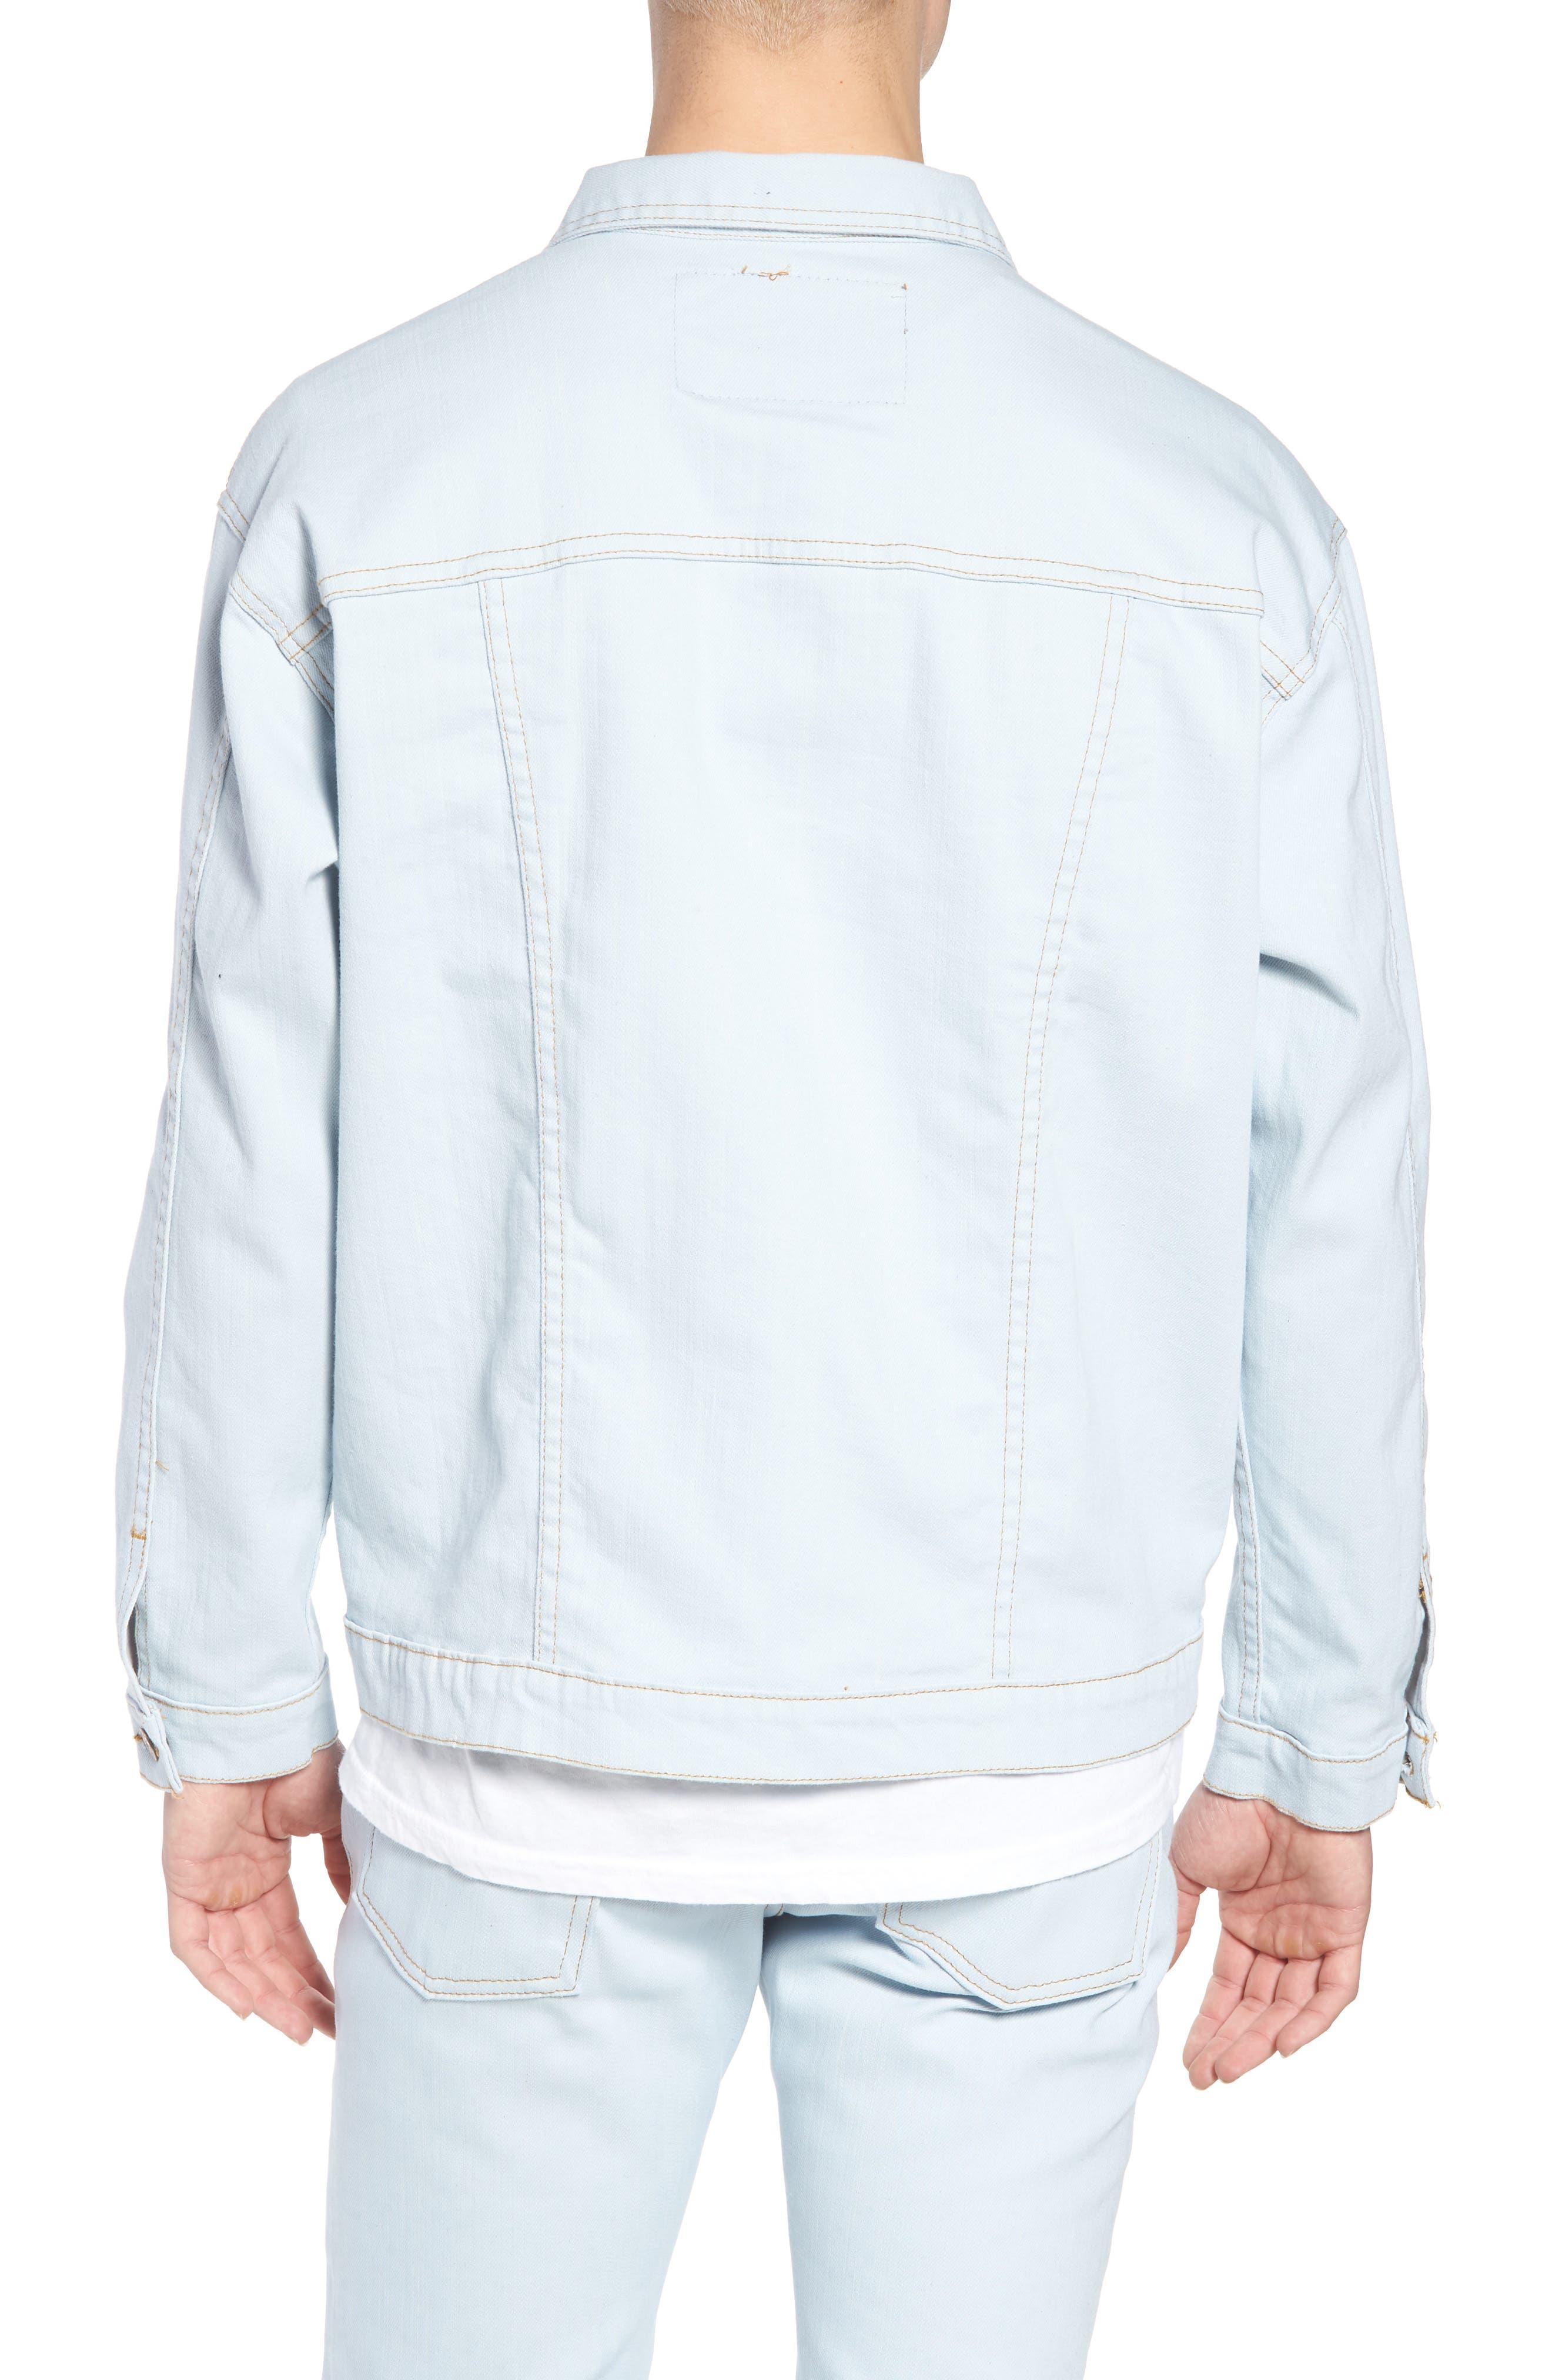 Oversize Jacket,                             Alternate thumbnail 2, color,                             Powder Blue